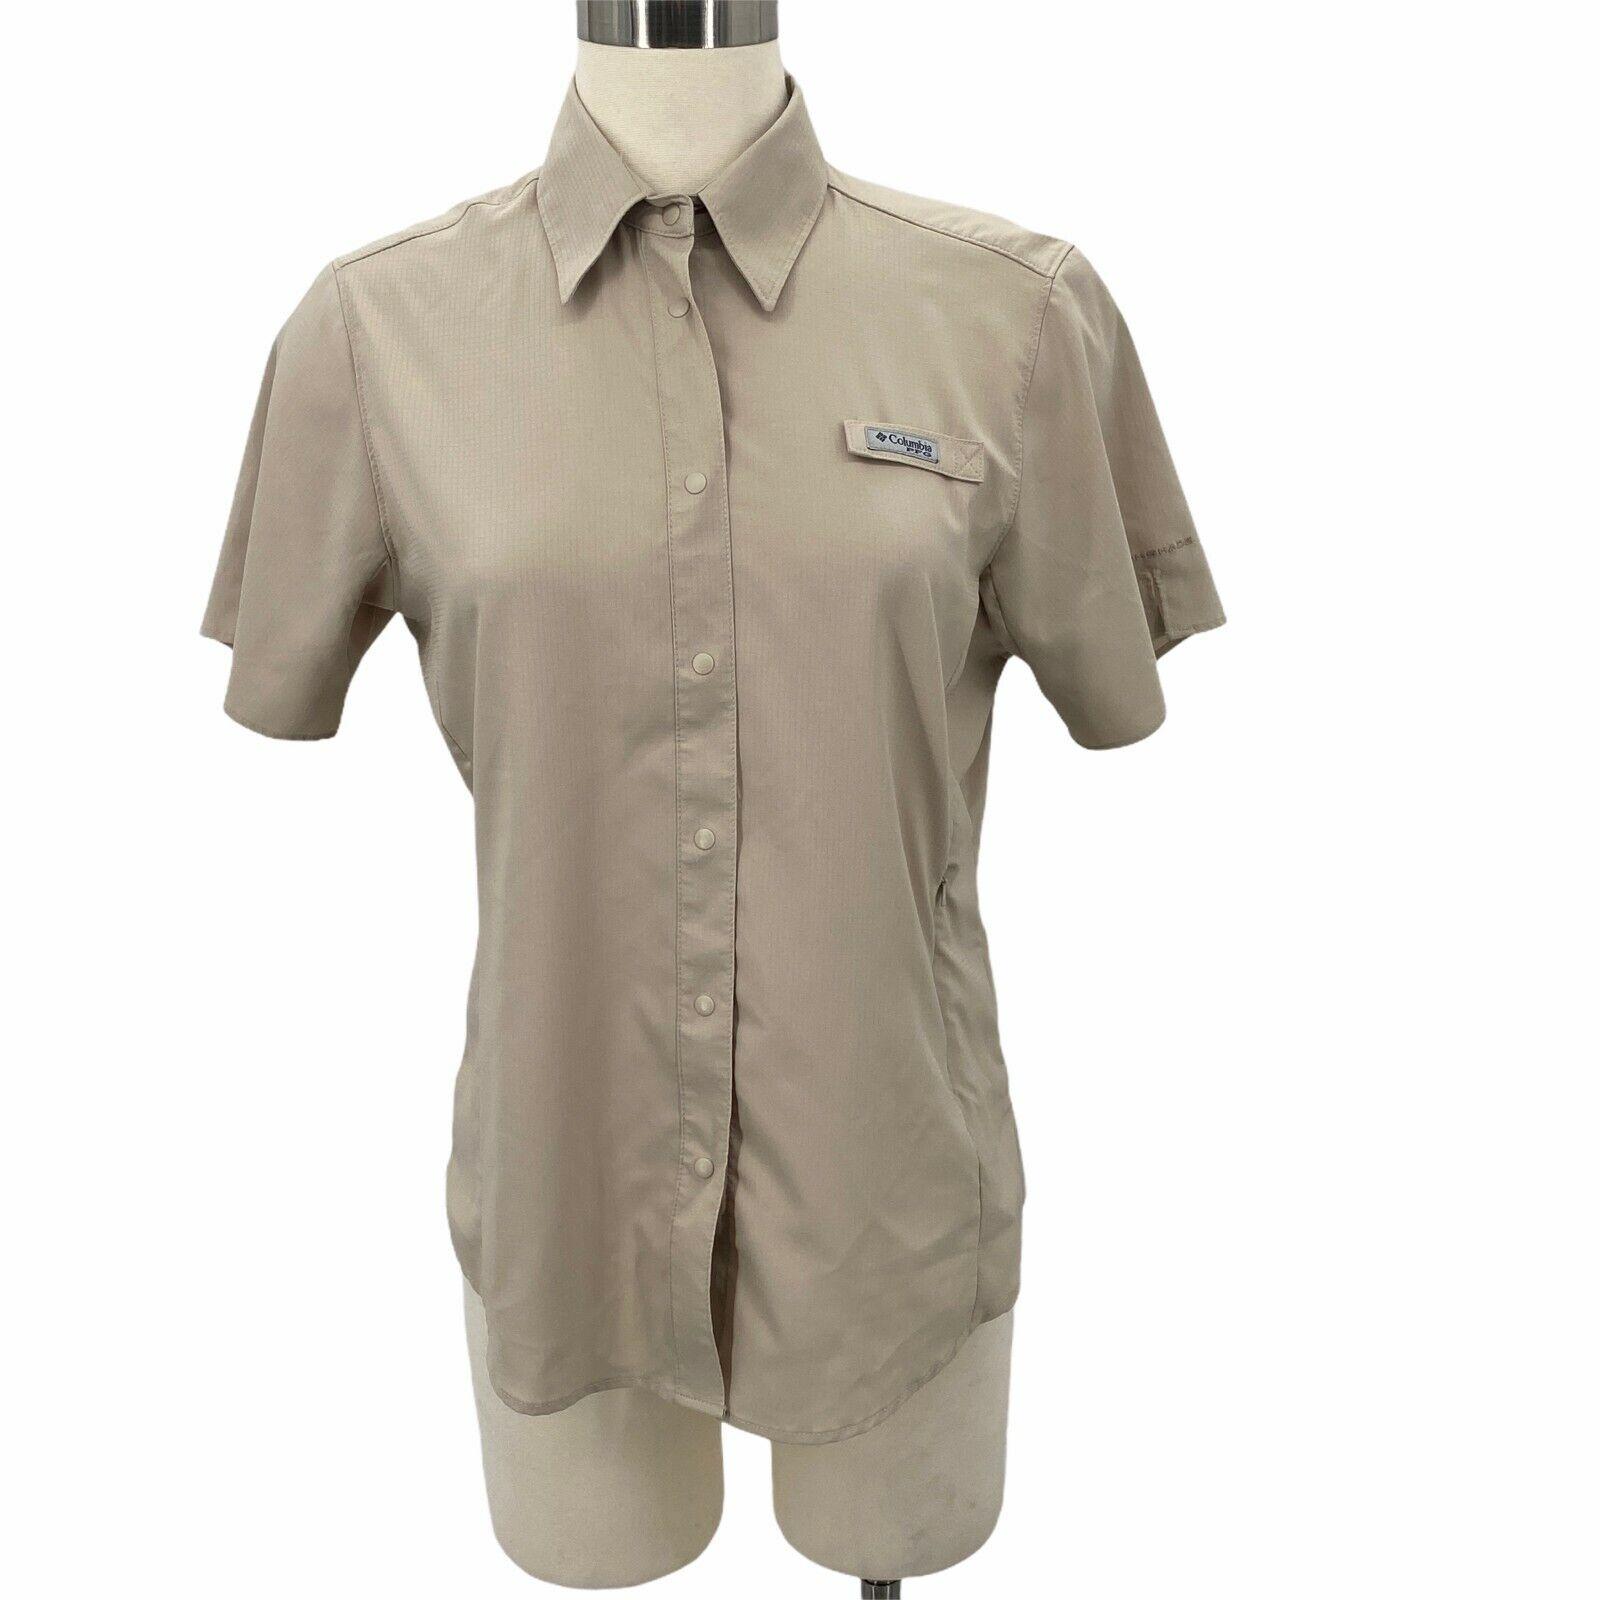 Columbia Pfg Shirt Crystal Springs Snap Up Vented Khaki Upf Women's Size Small